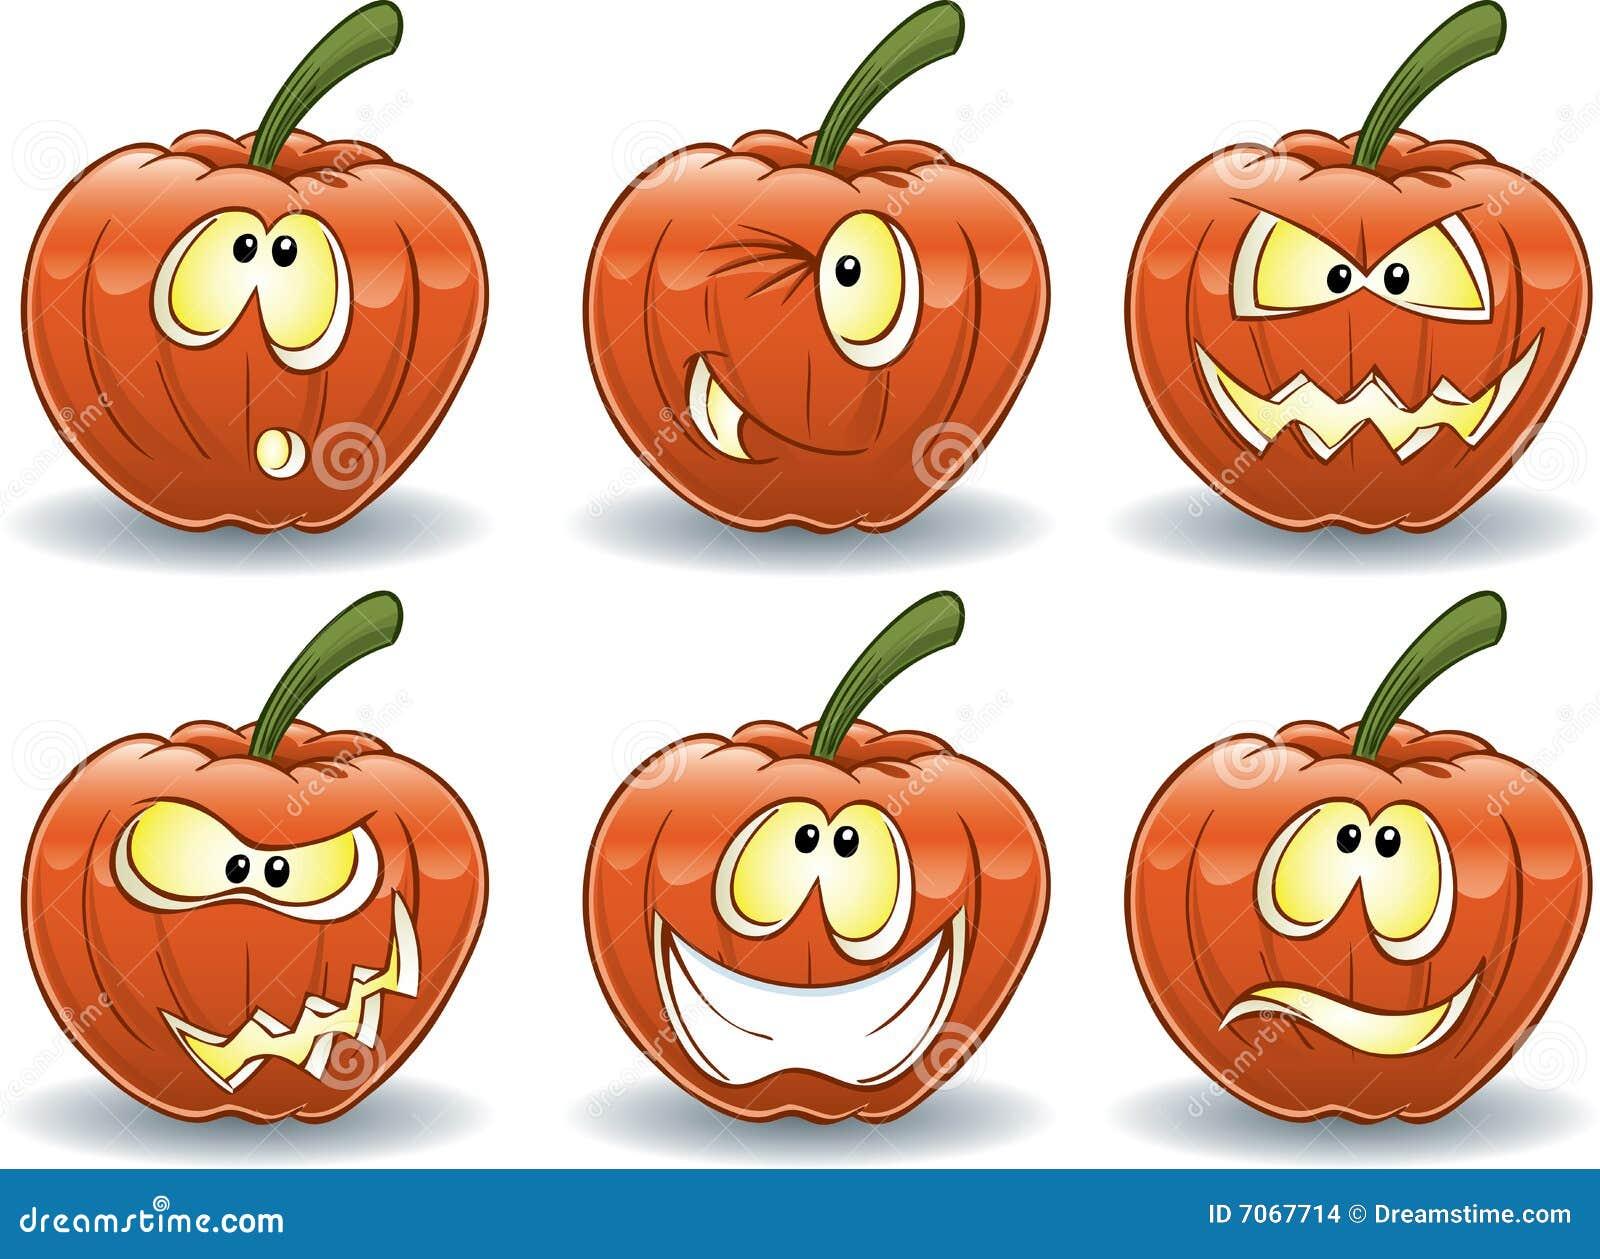 Pumpkin Emoticons Stock Images